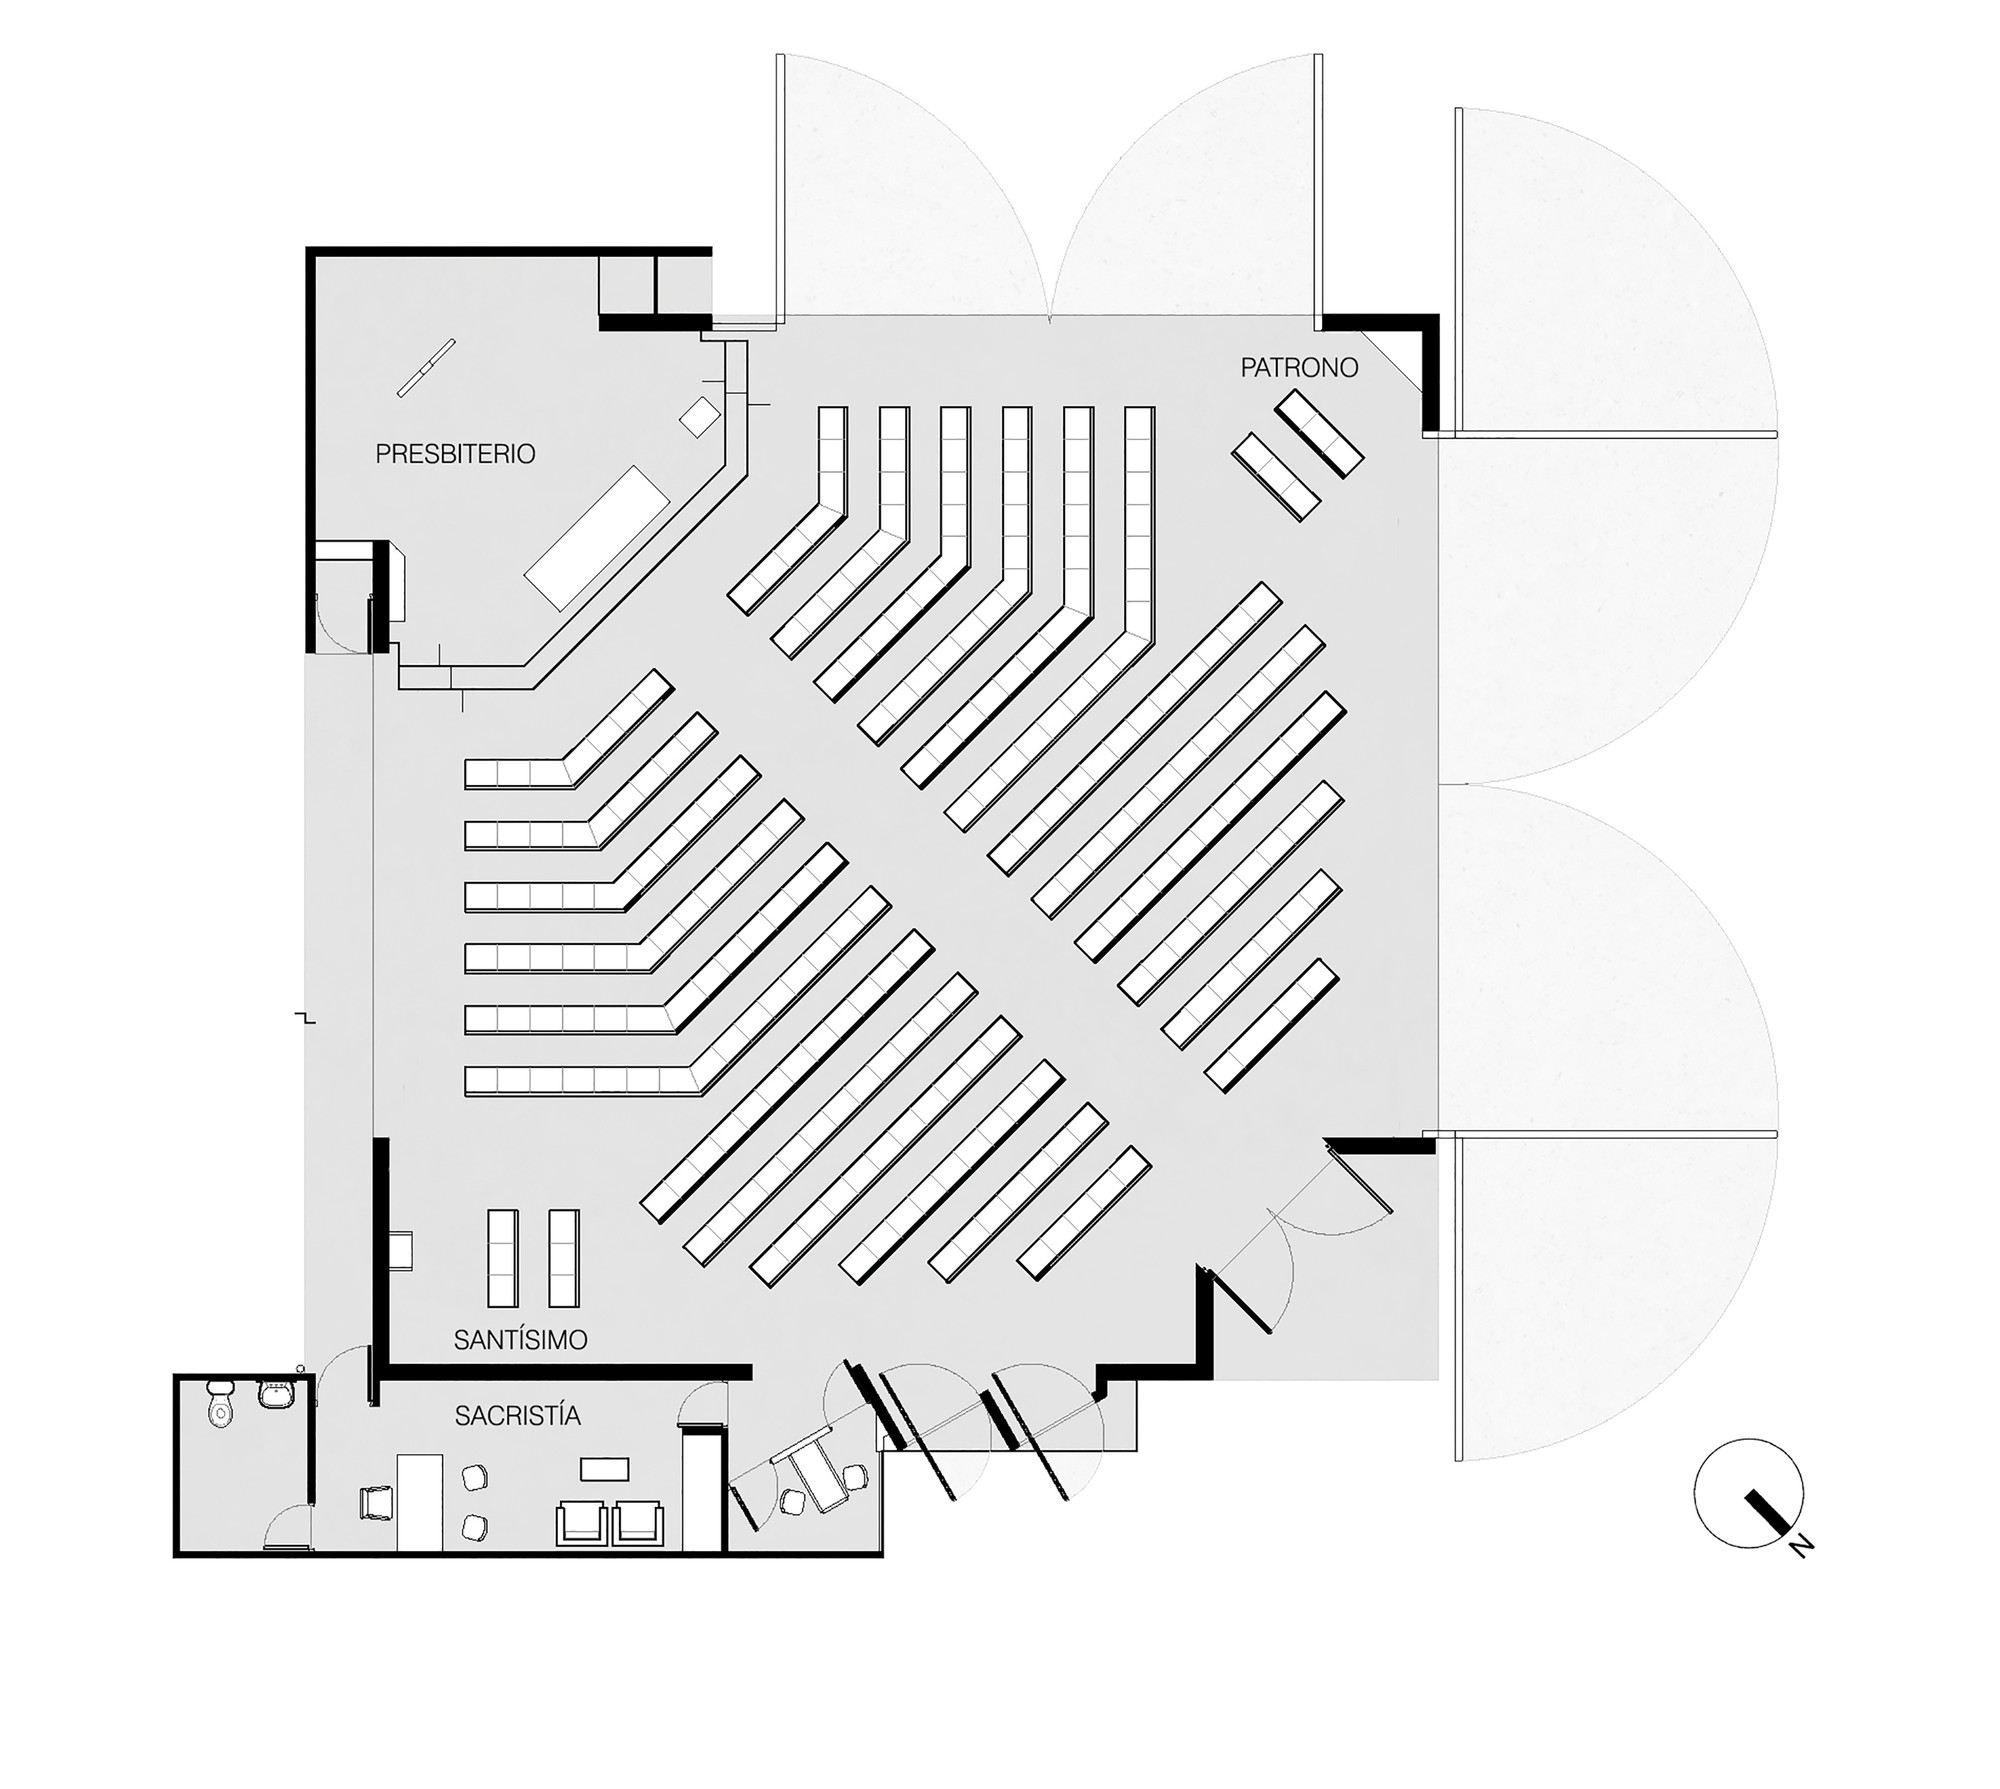 Capilla san alberto magno juan pavez aguilar jos for Dimensiones arquitectonicas